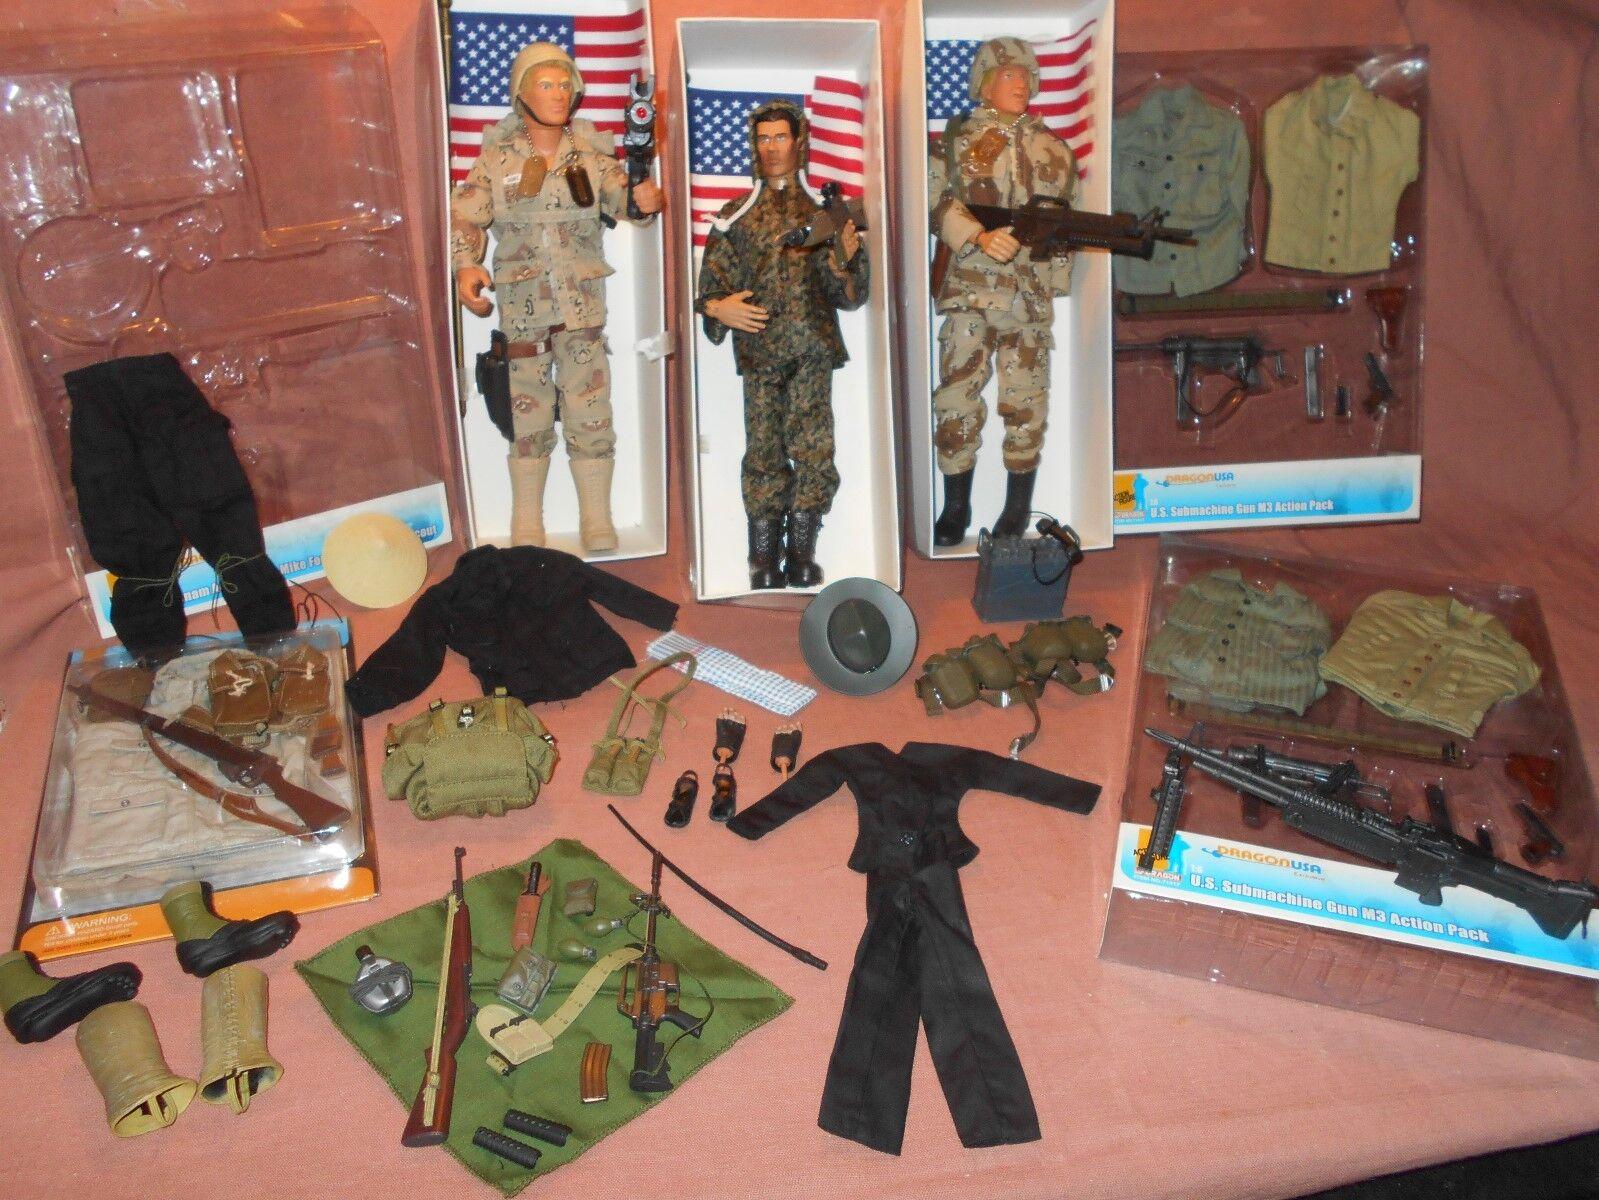 1 6 ACE MIKE FORCE  GI JOE BARON  UNIFORMS GUNS AMMO stivali PLUS READ DESCRIPTION